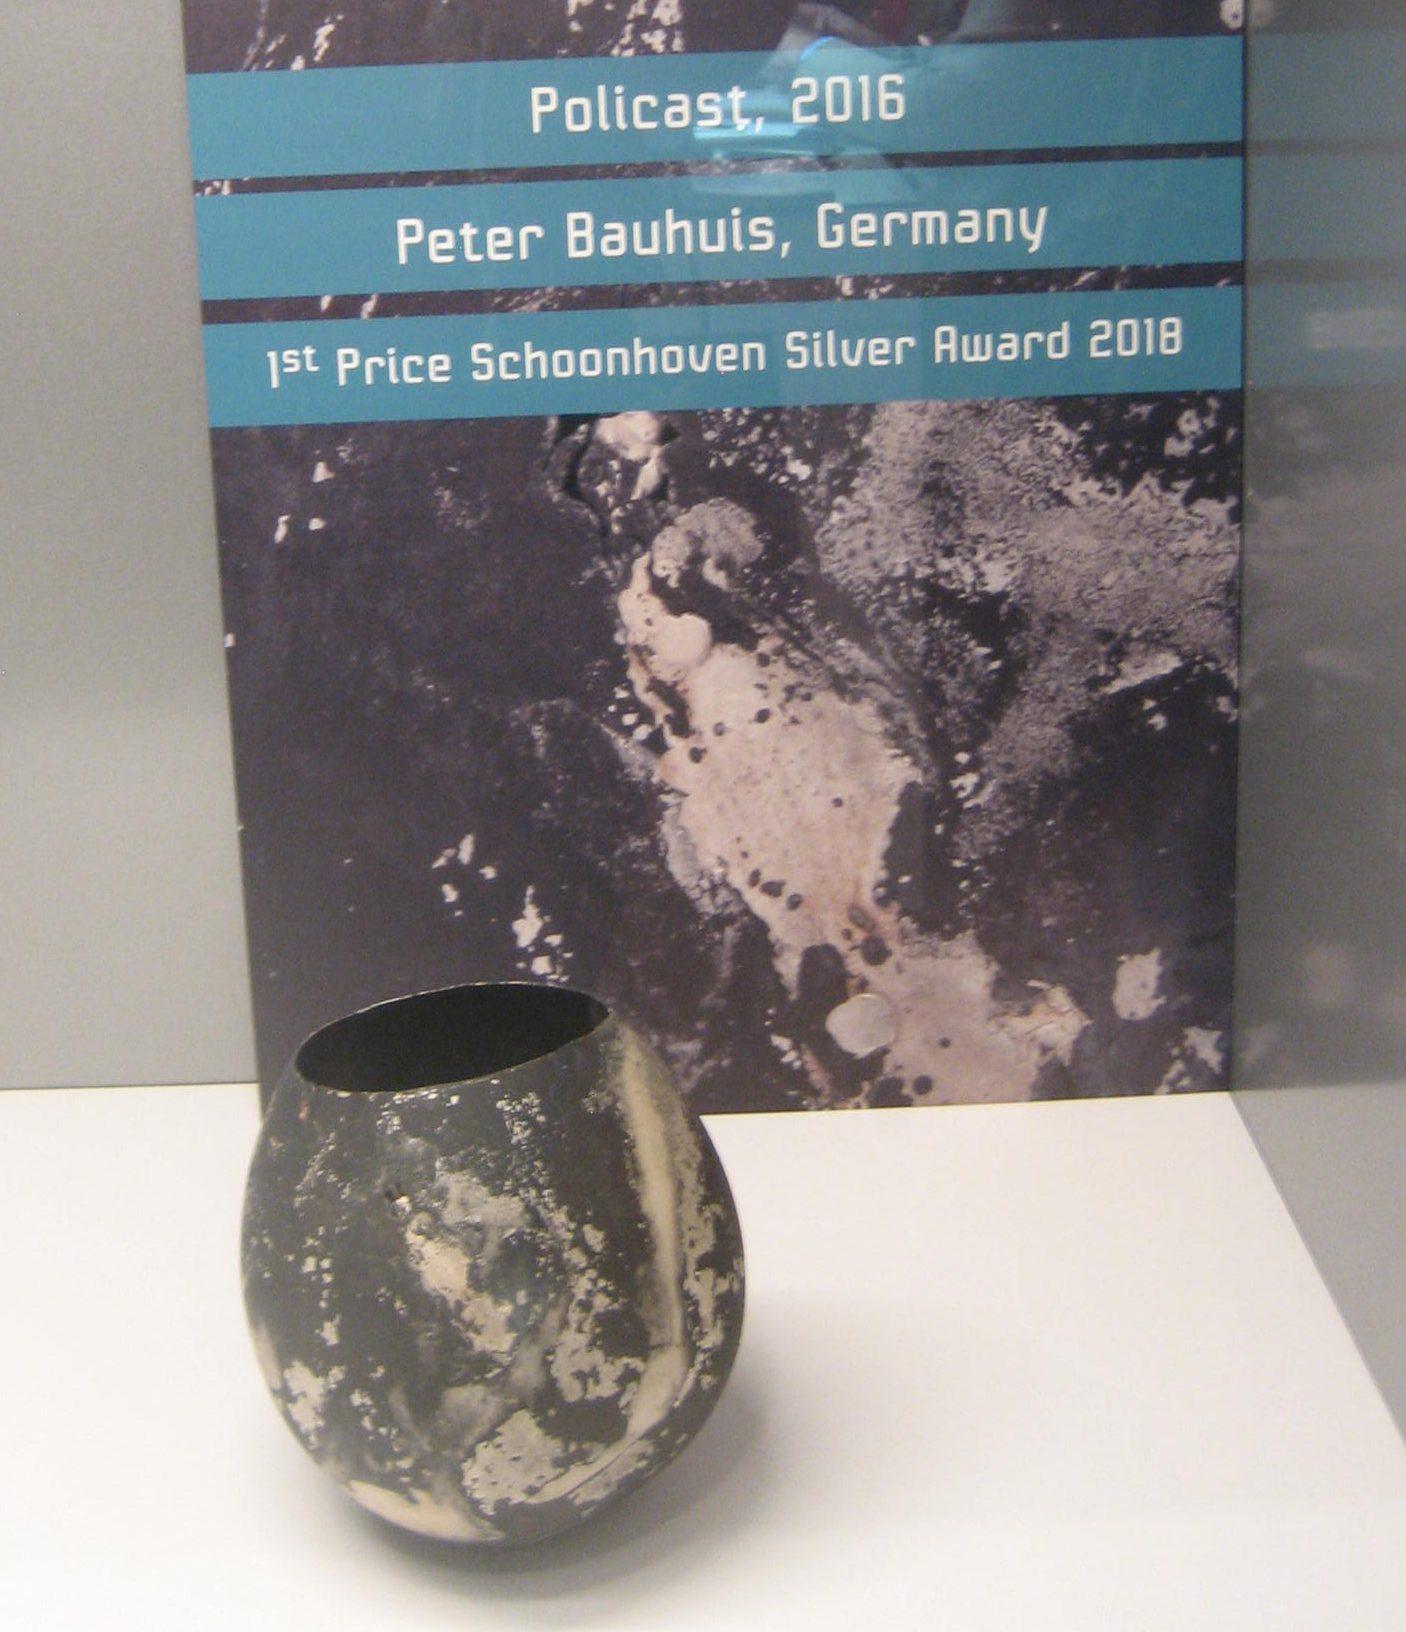 Peter Bauhuis, Policast, 2016, zilver, tentoonstelling, vitrine